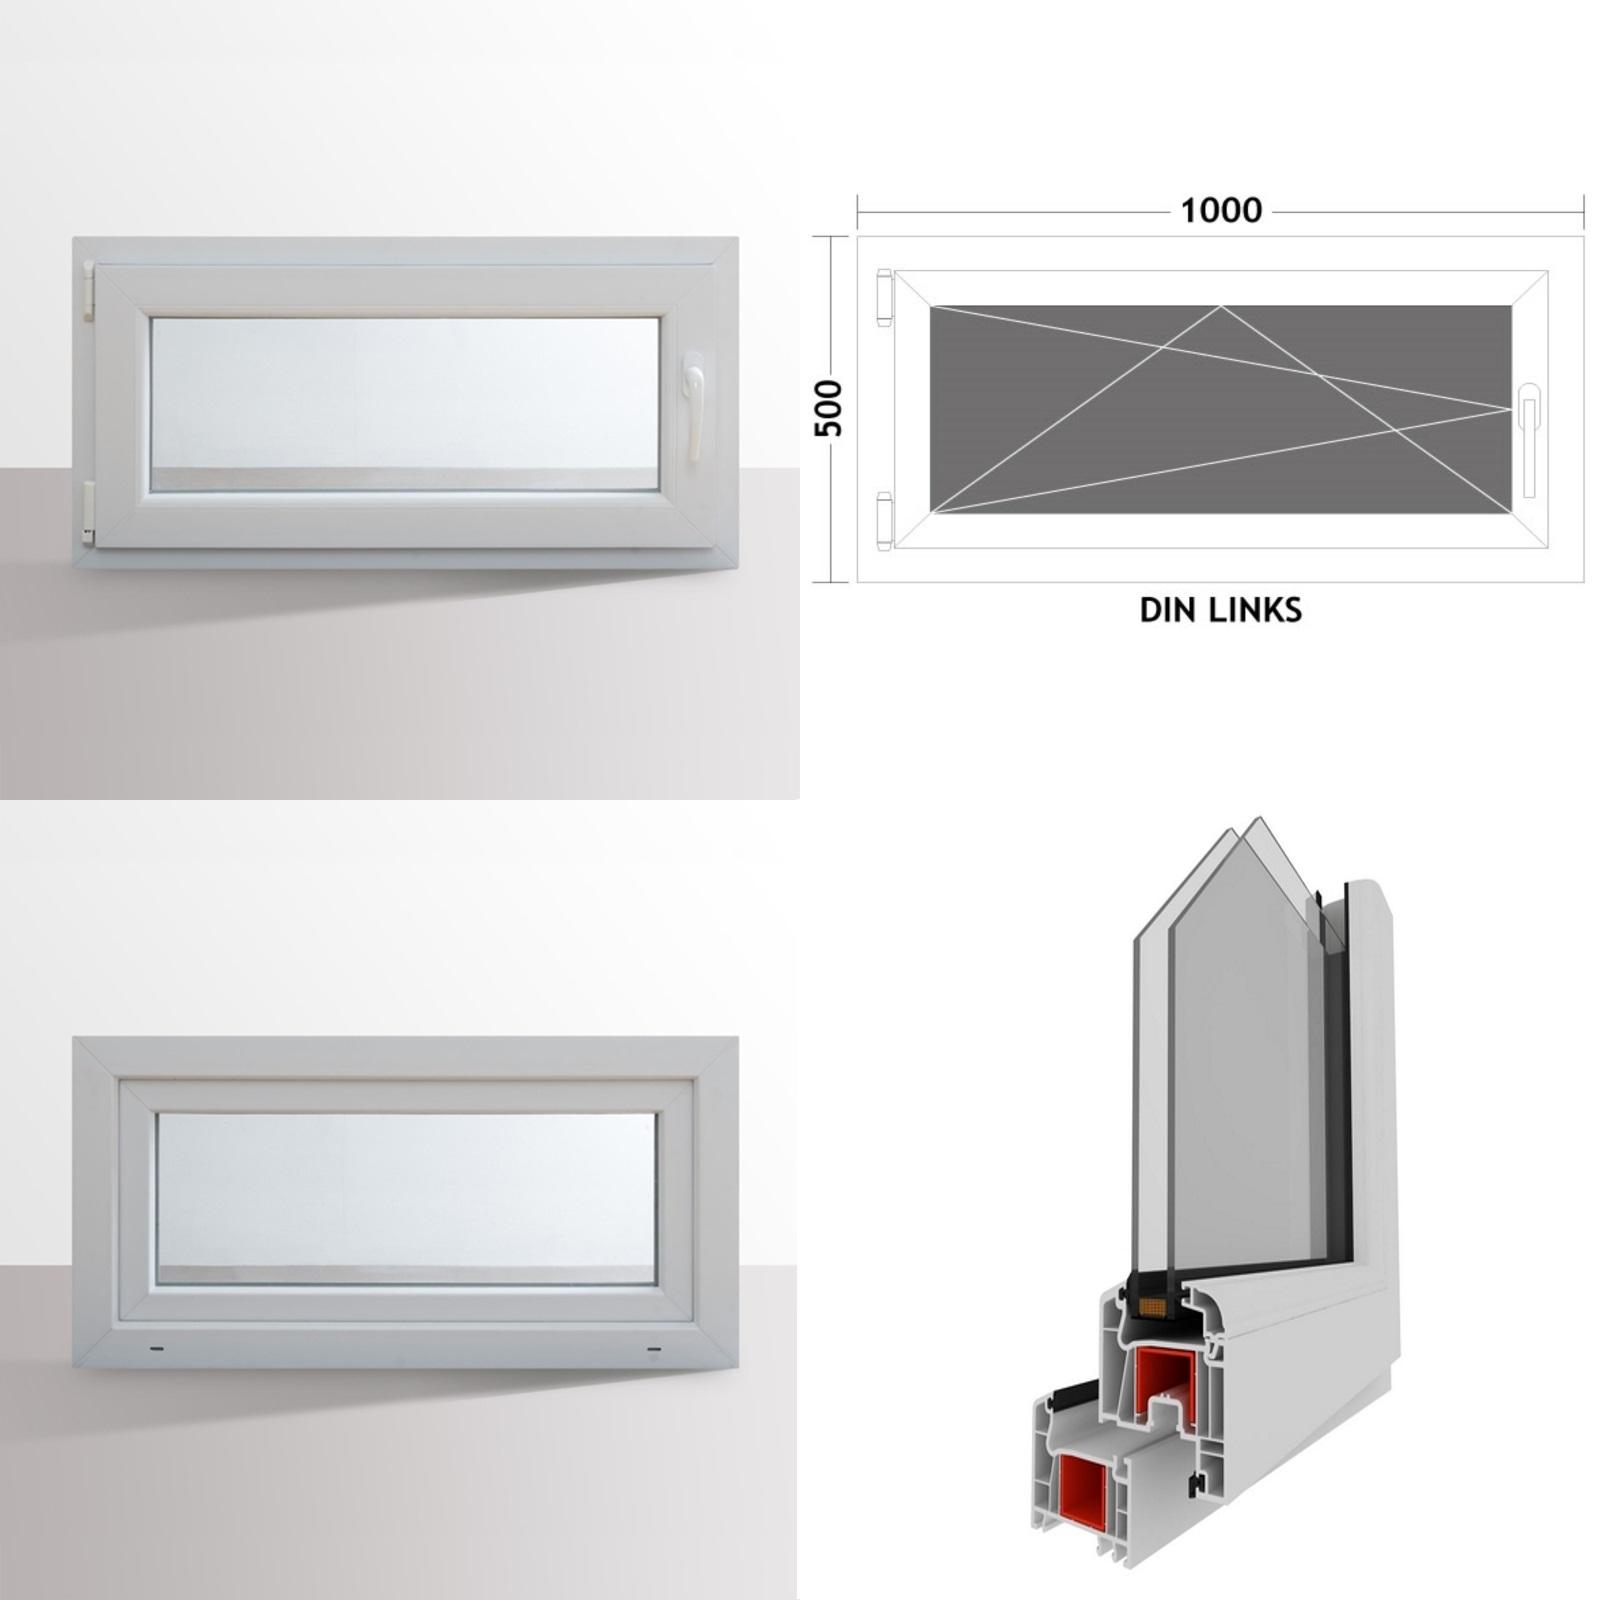 fenster kunststofffenster kellerfenster dreh kipp fenster 2-fach